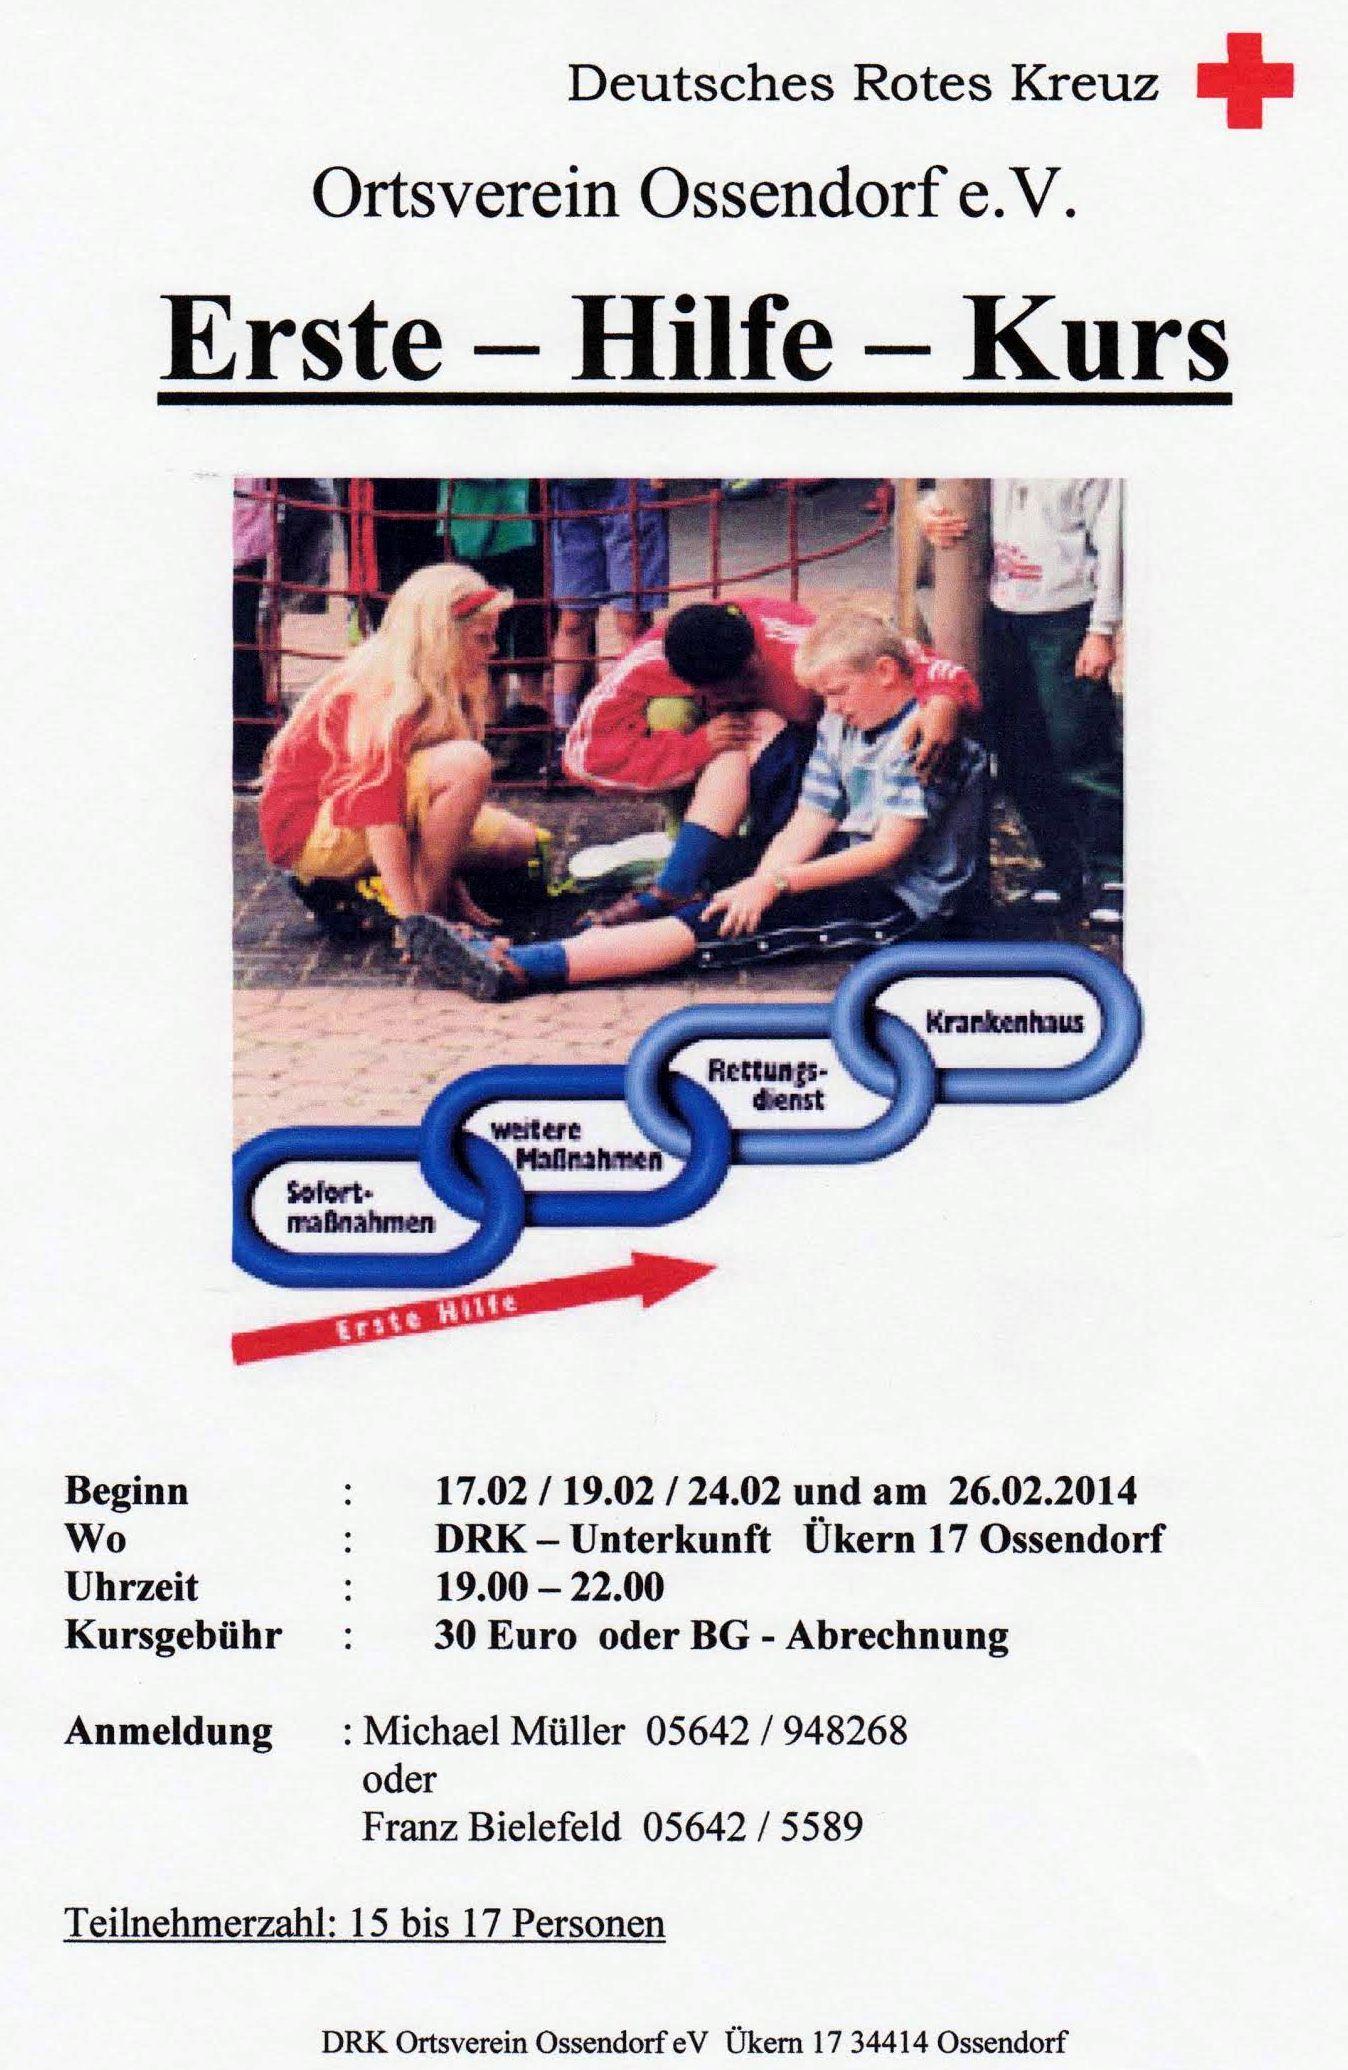 Erste Hile Kurs 2014 DRK Ossendorf